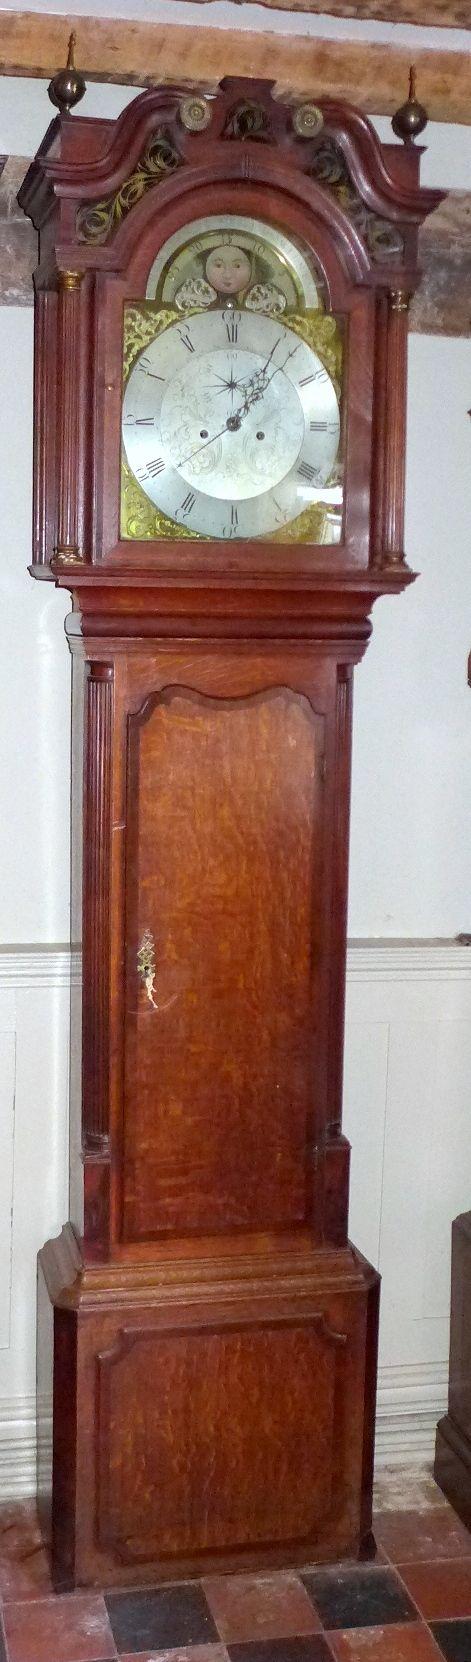 18th cent oak mahogany moon dial long case grandfather clock